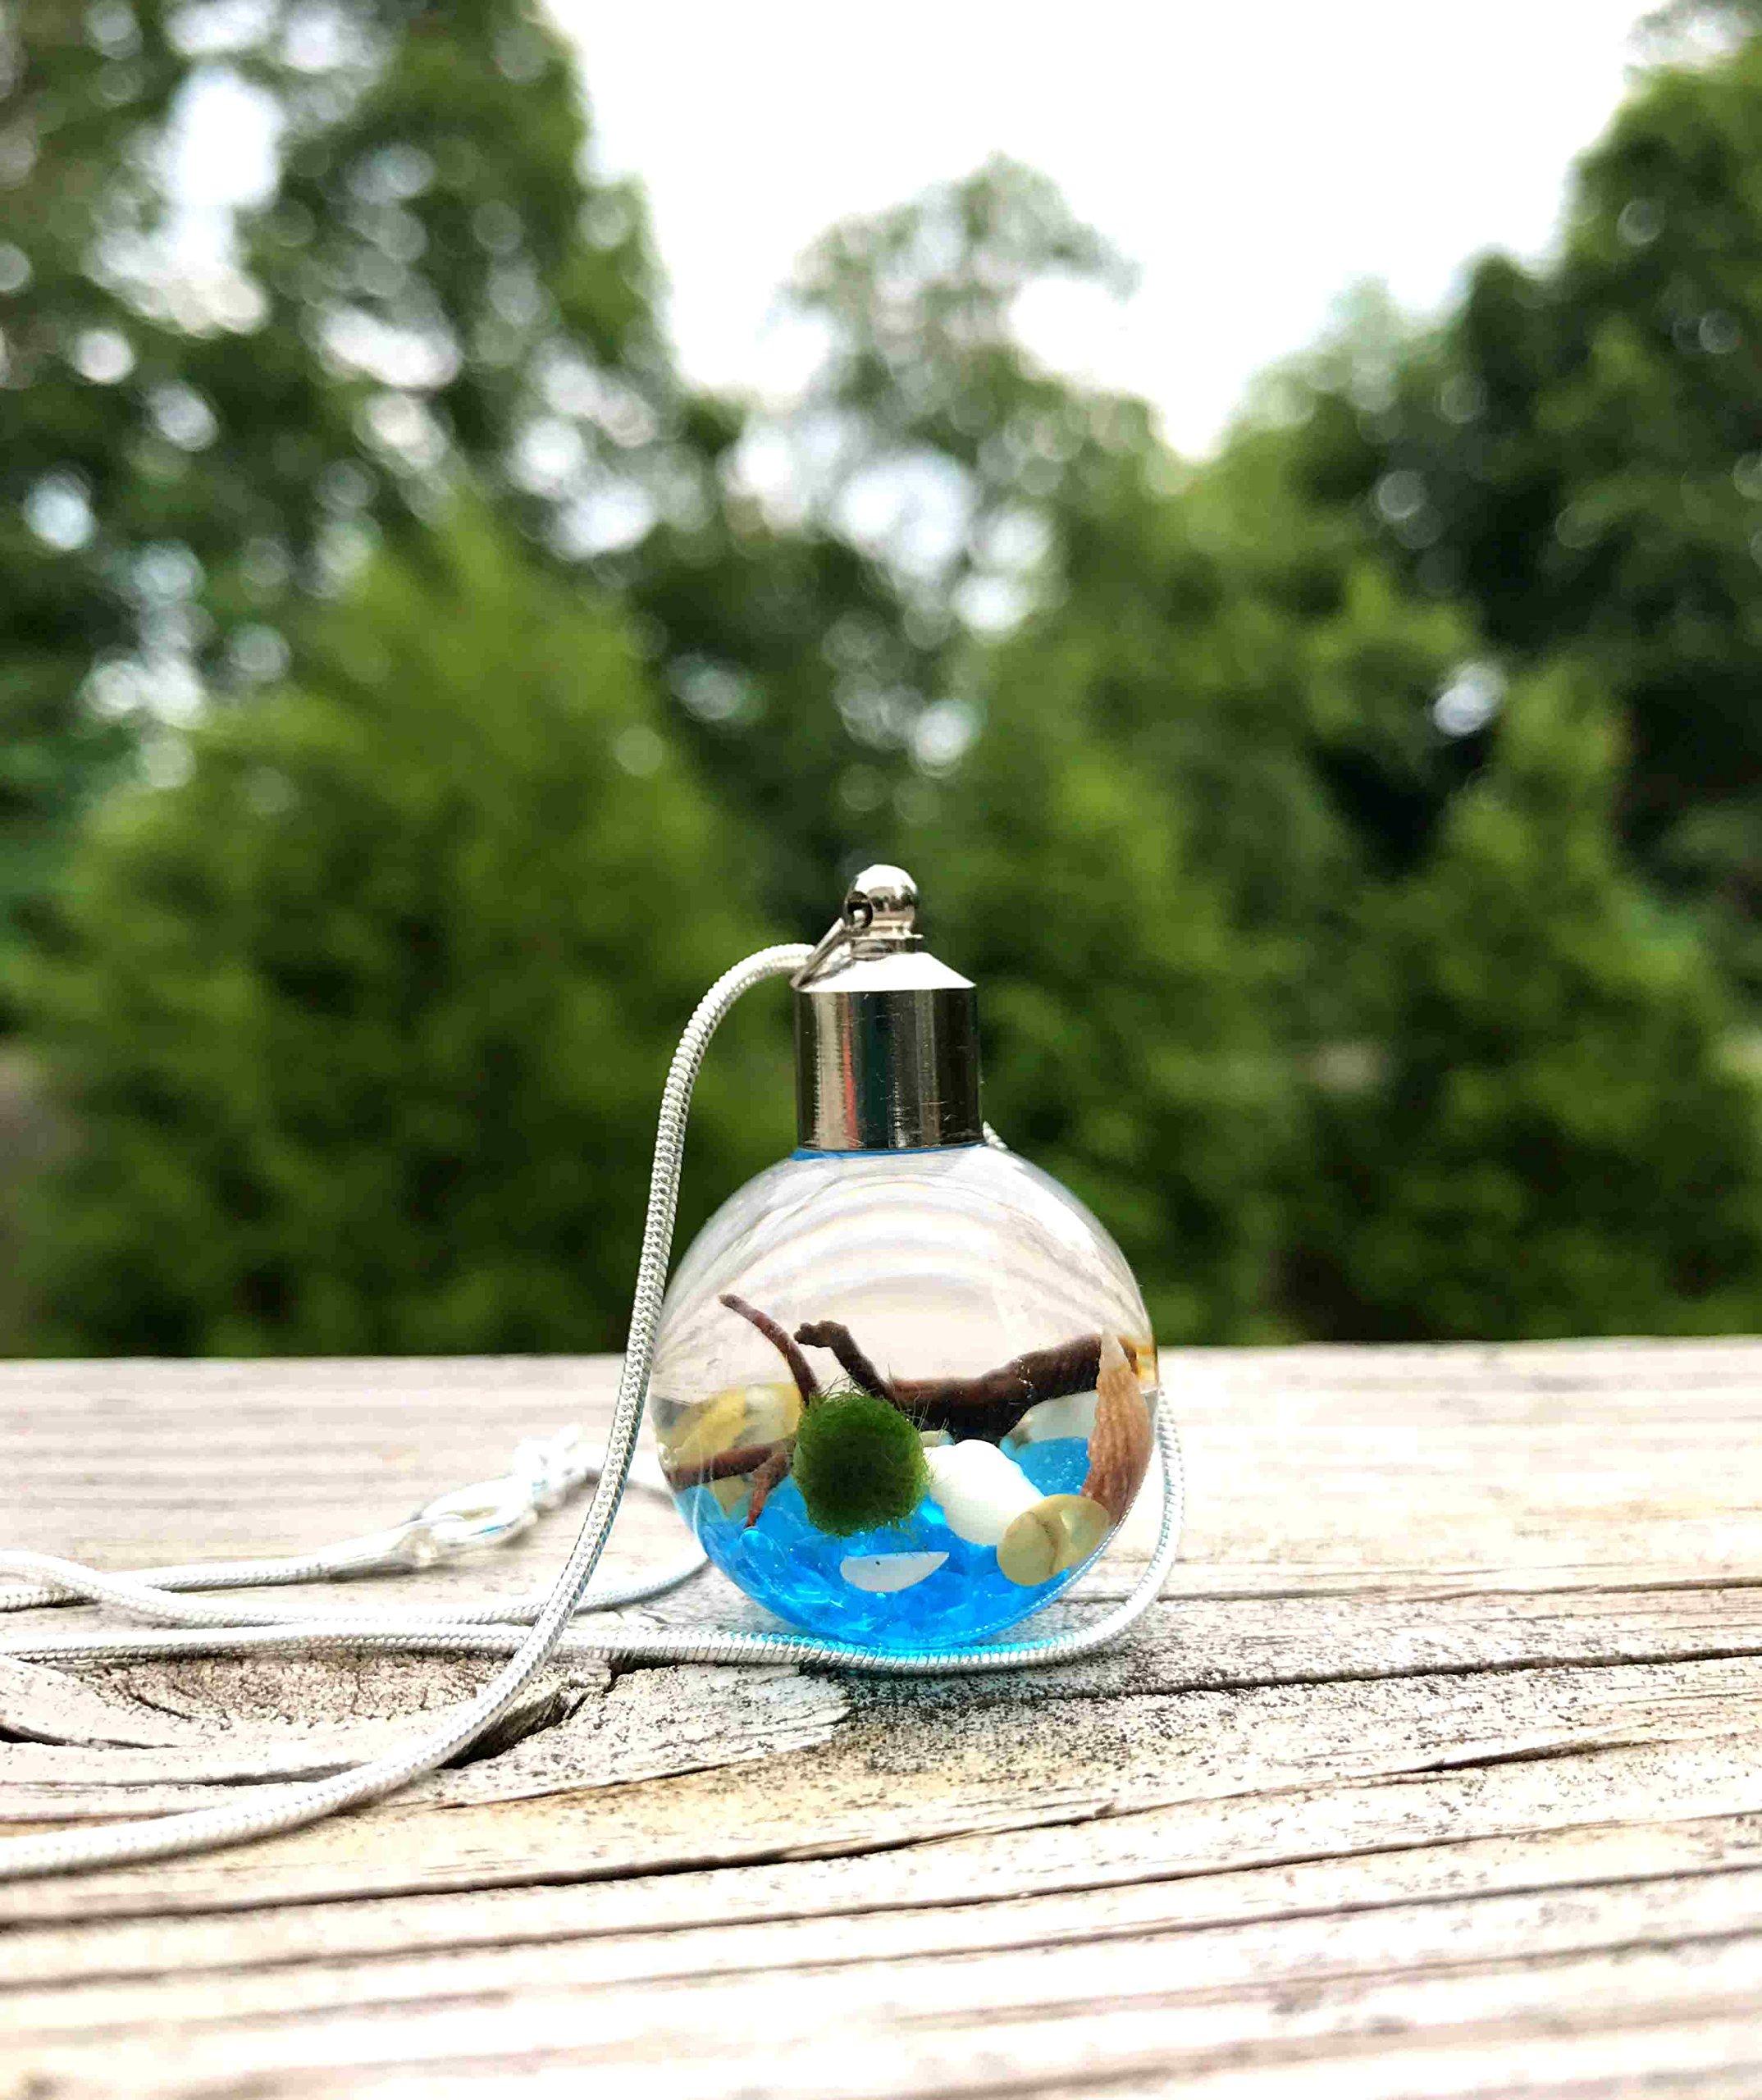 Marimo Moss Ball Necklace Live Terrarium Necklace Wearable Plant Necklace Plant Fashion Accessories - Sky Blue